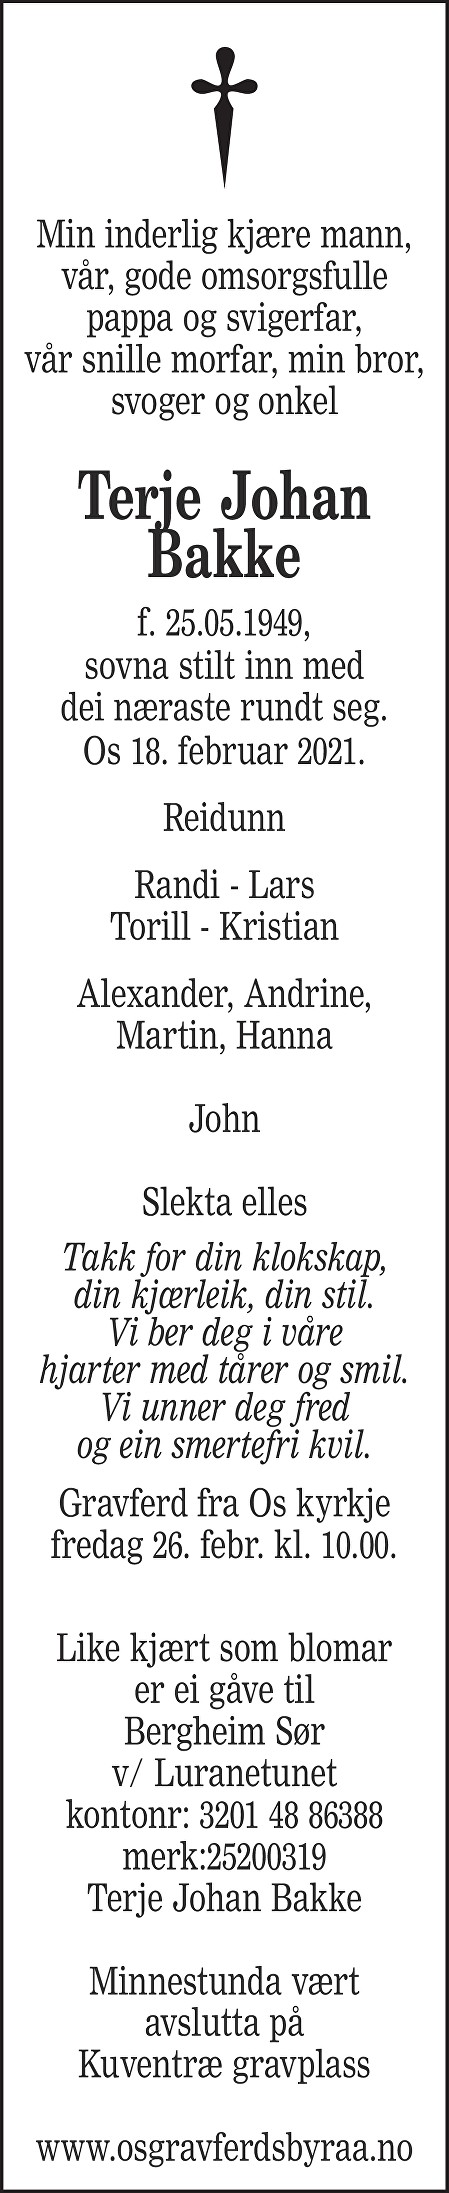 Terje Johan Bakke Dødsannonse